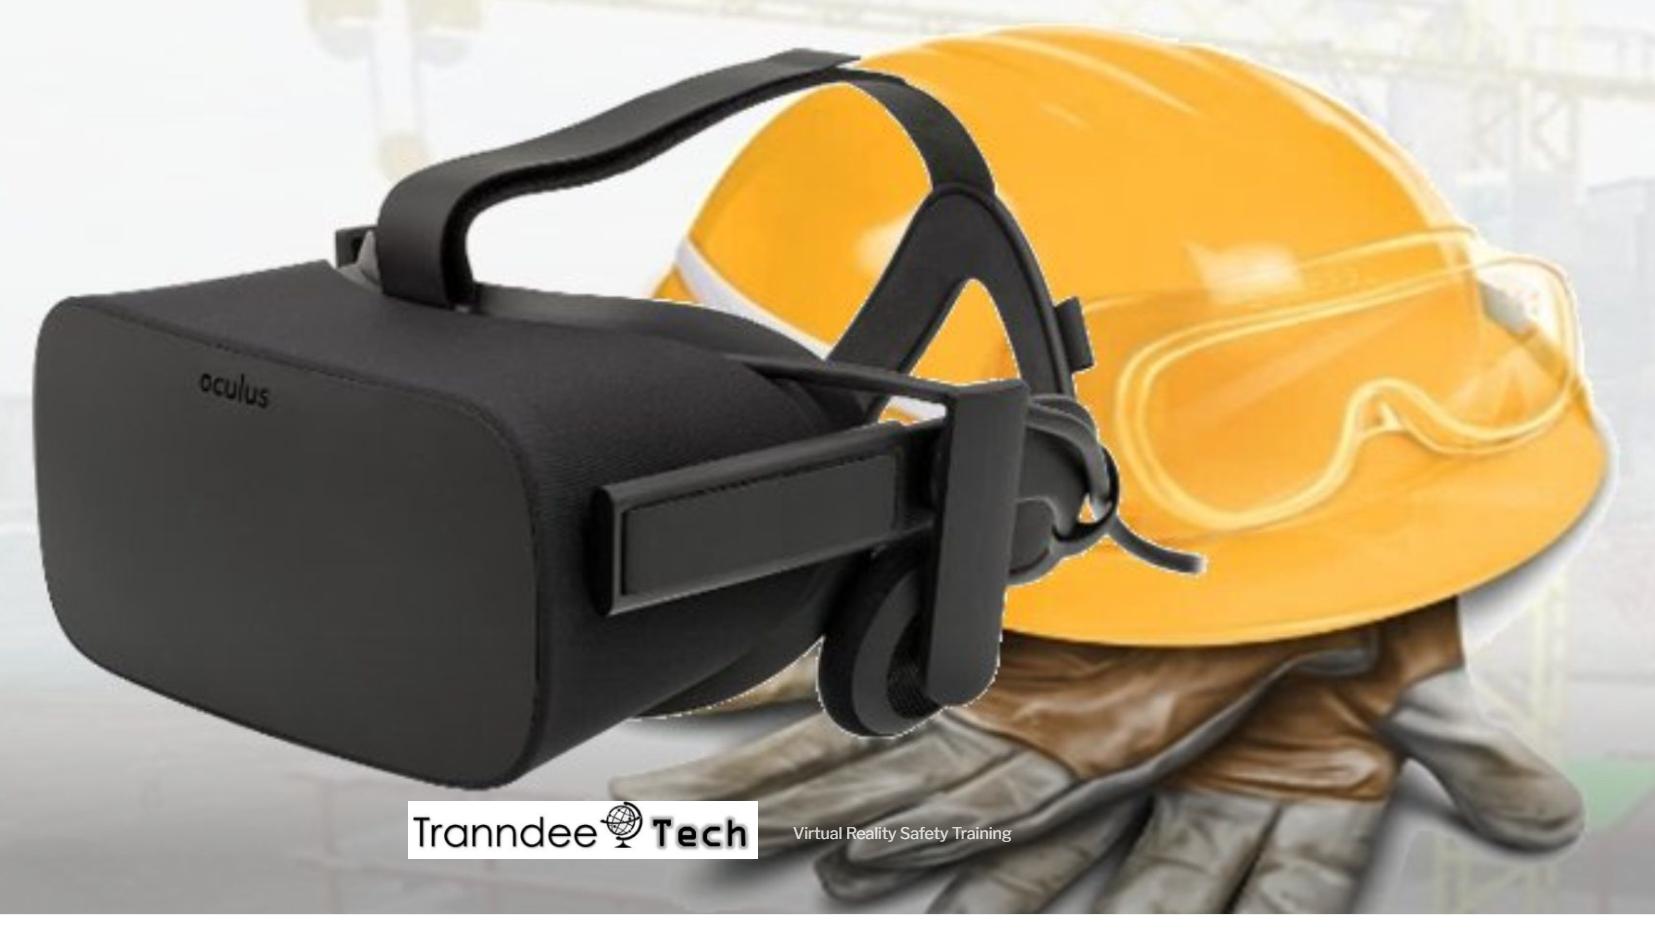 Tranndee Tech Website